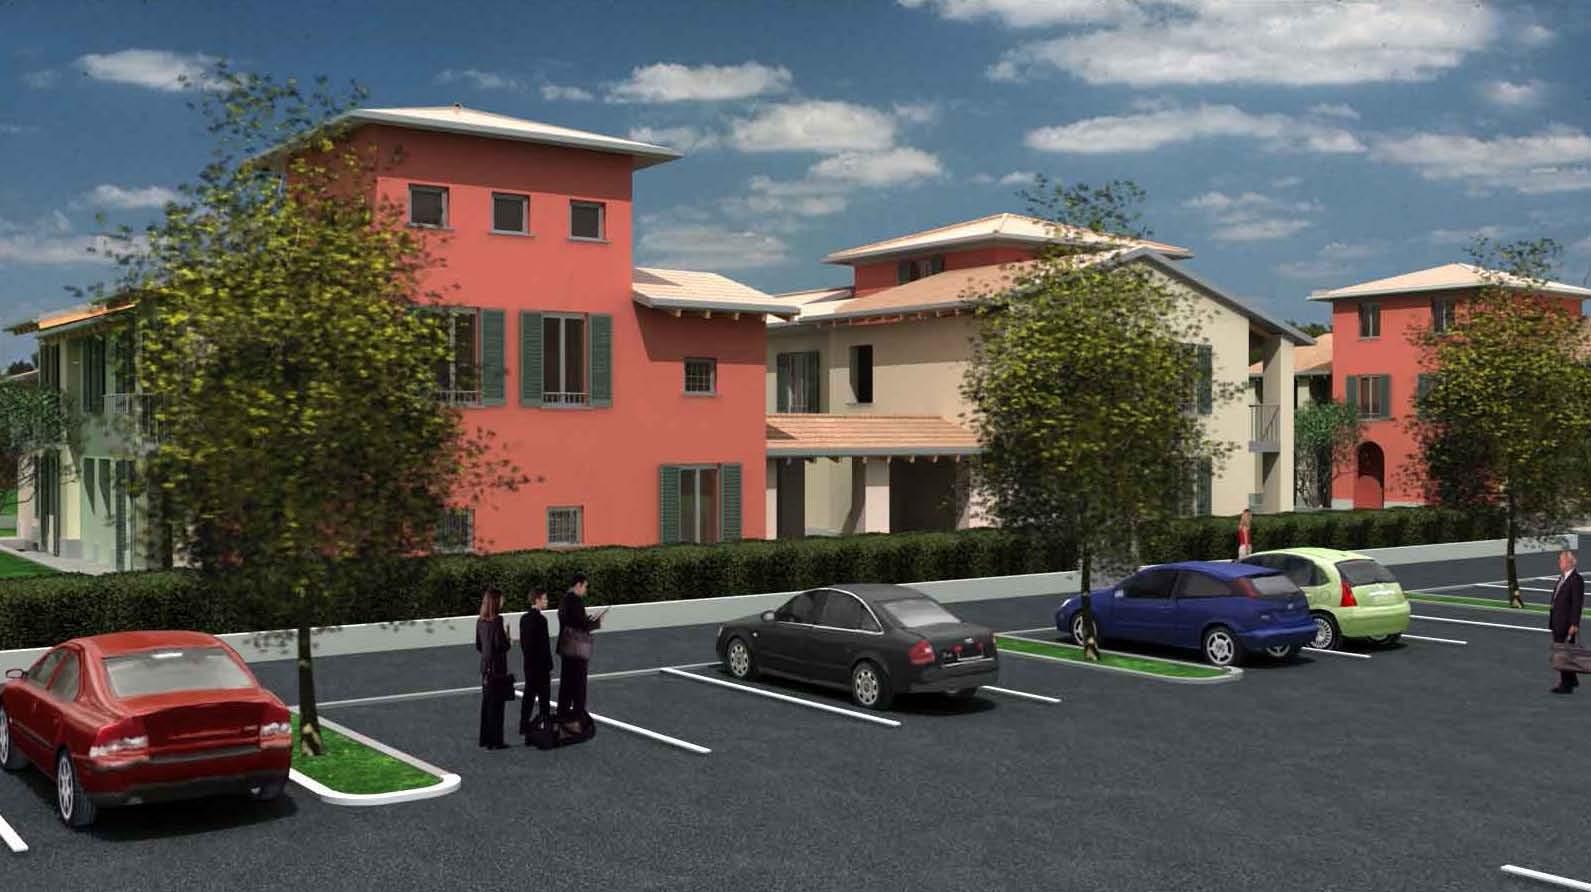 Complesso residenziale, Vaprio d'Adda